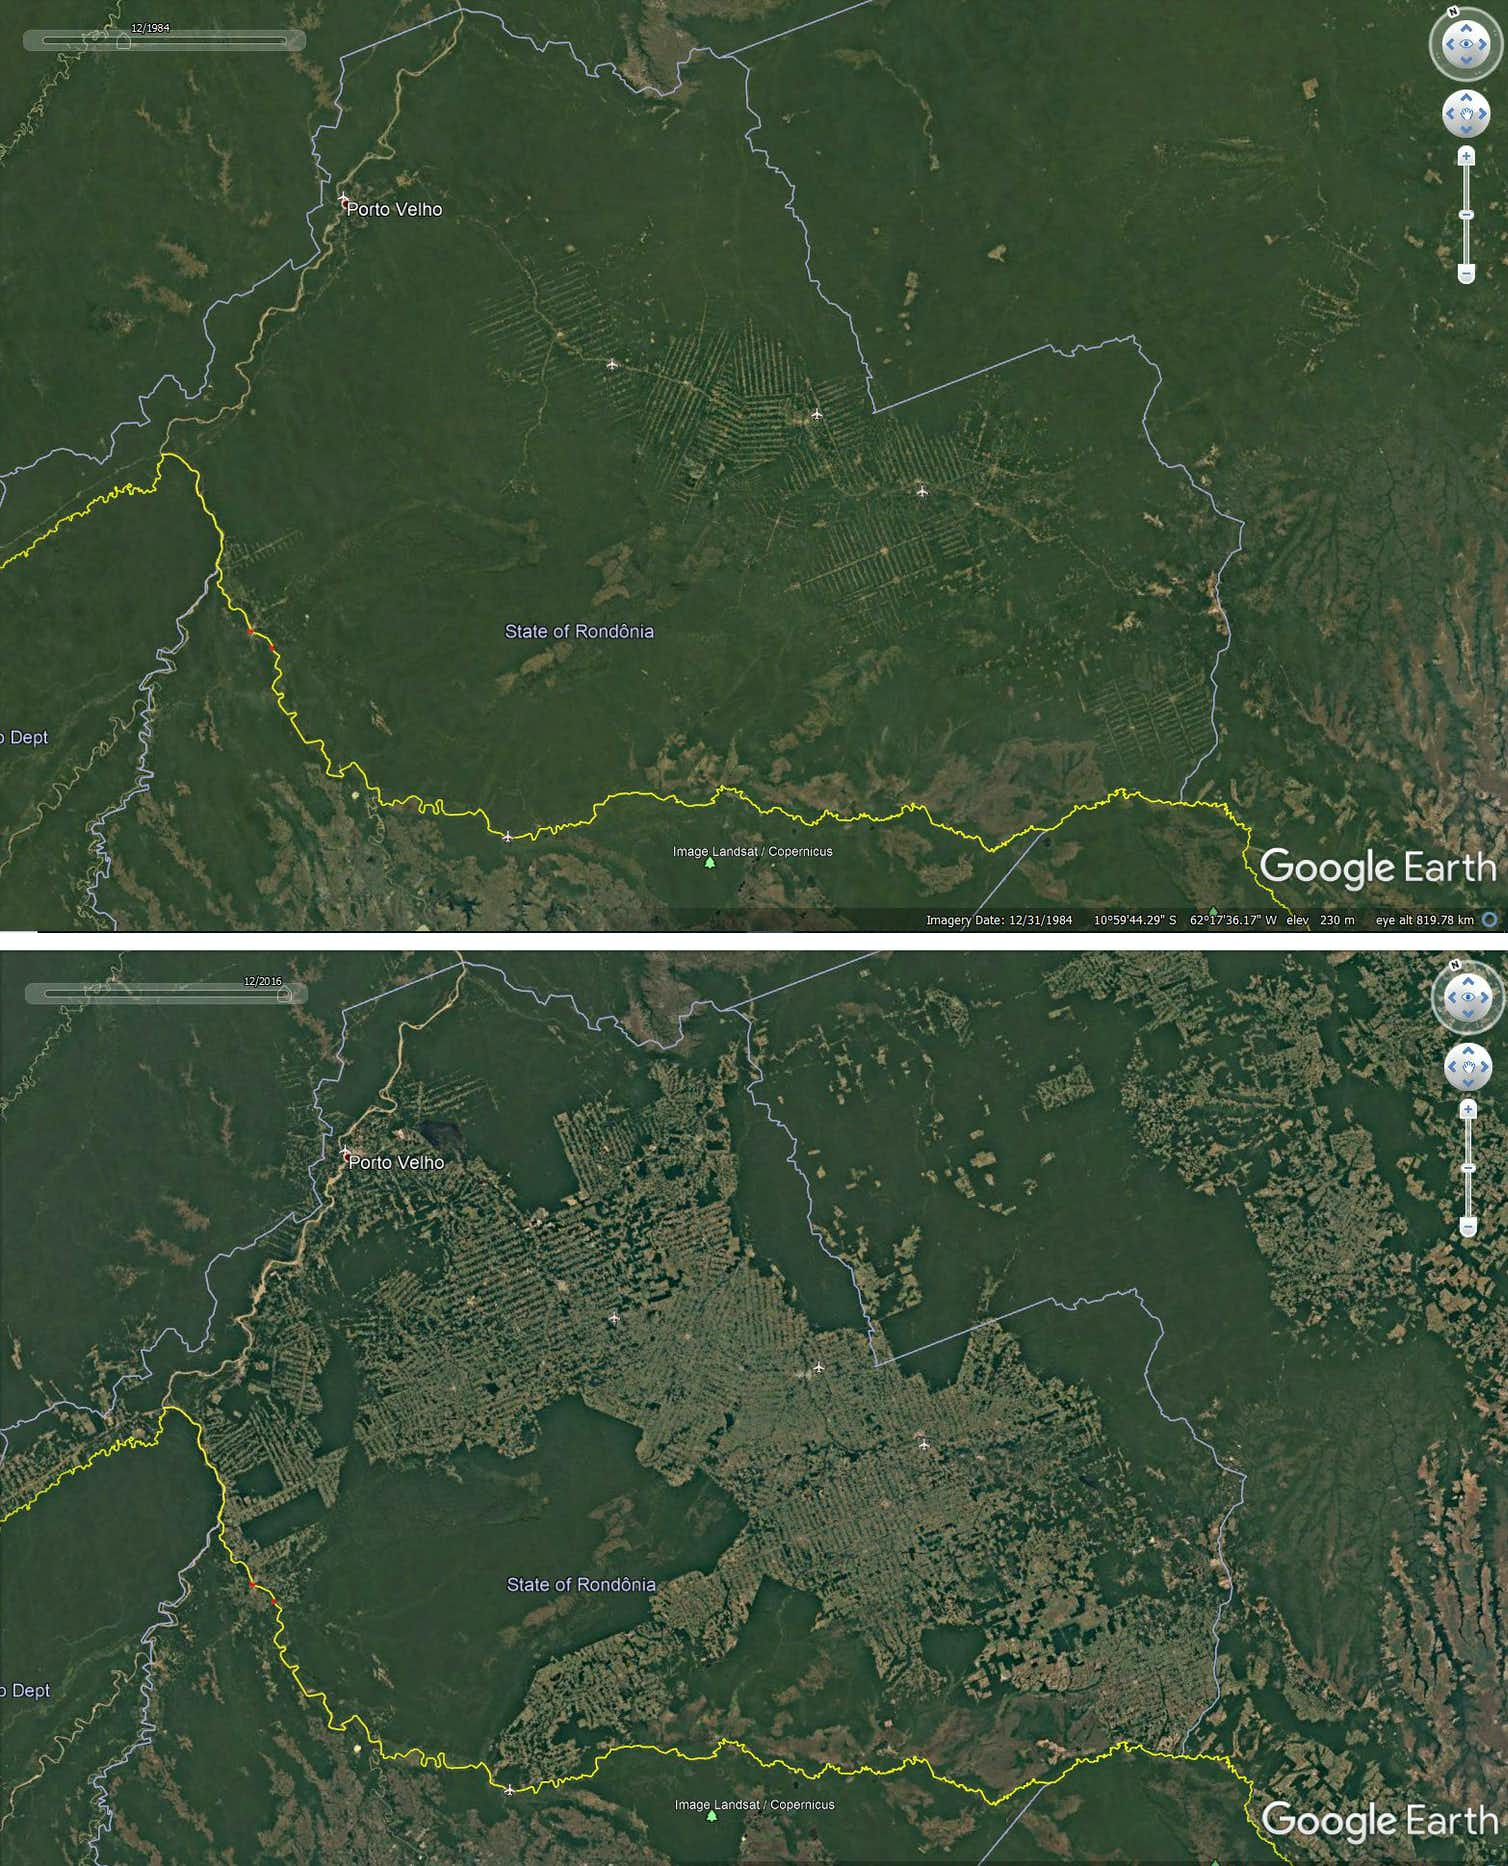 Deforestation around roads in Rondonia, Brazil, 1984-2016. Credit: Google Earth